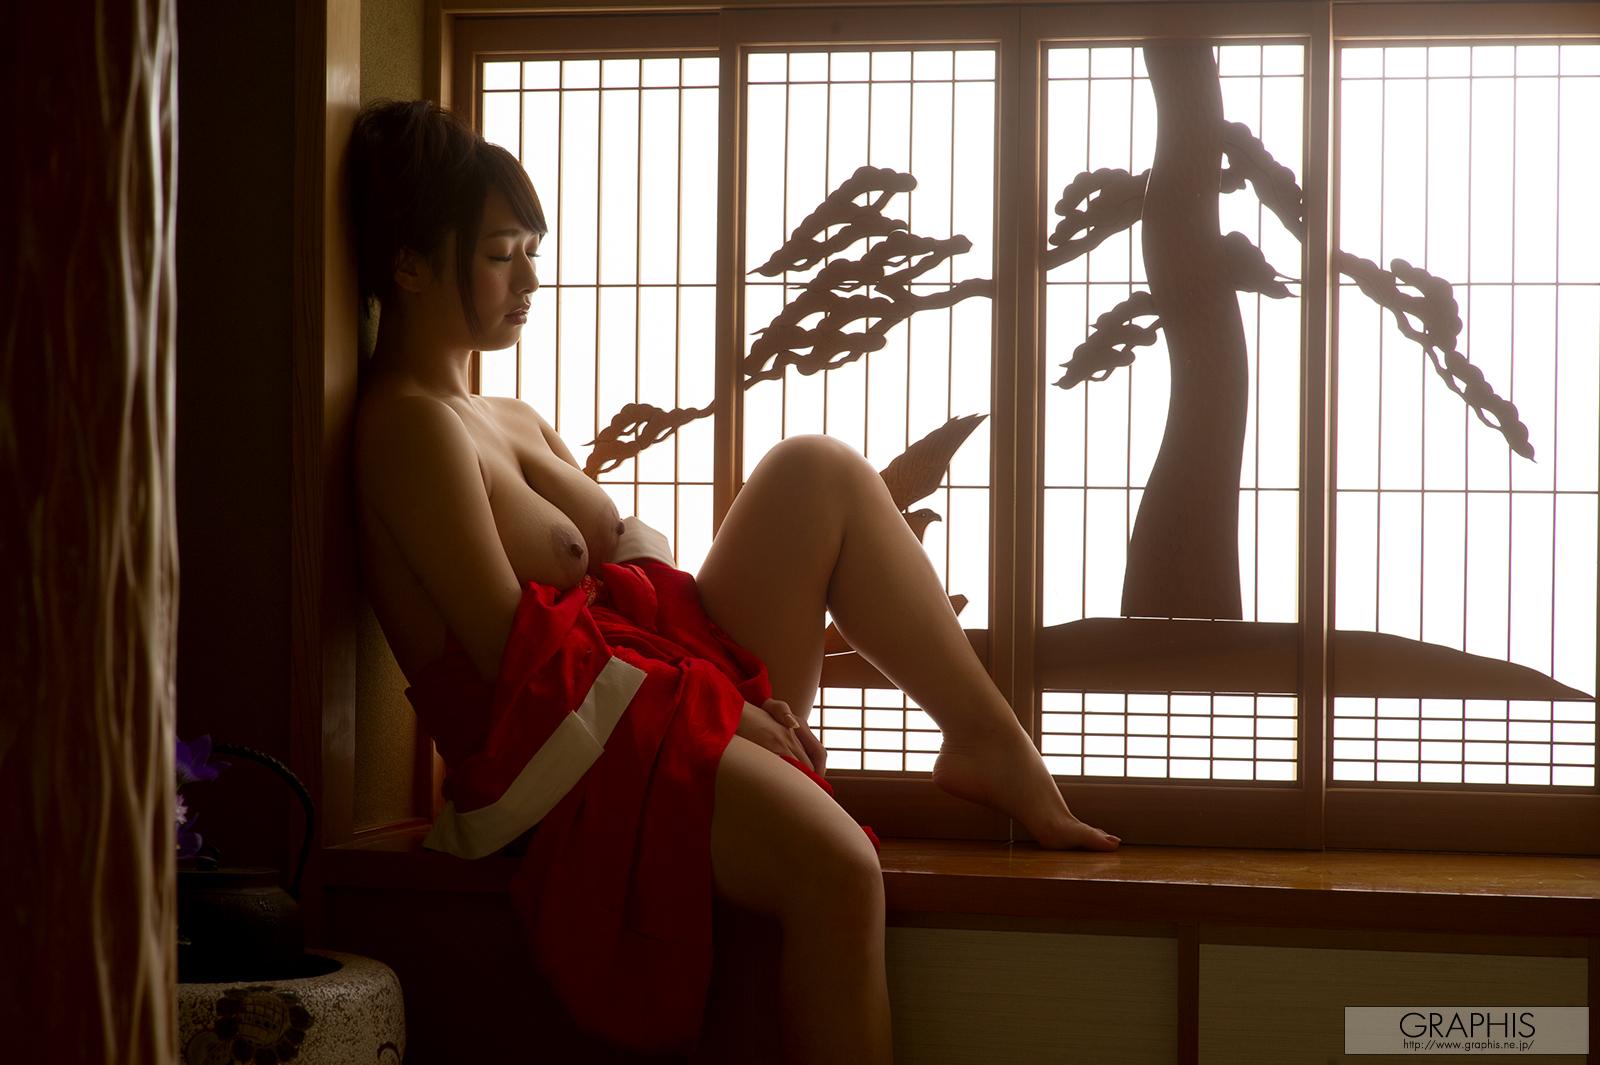 marina-shiraishi-red-kimono-boobs-naked-asian-graphis-18